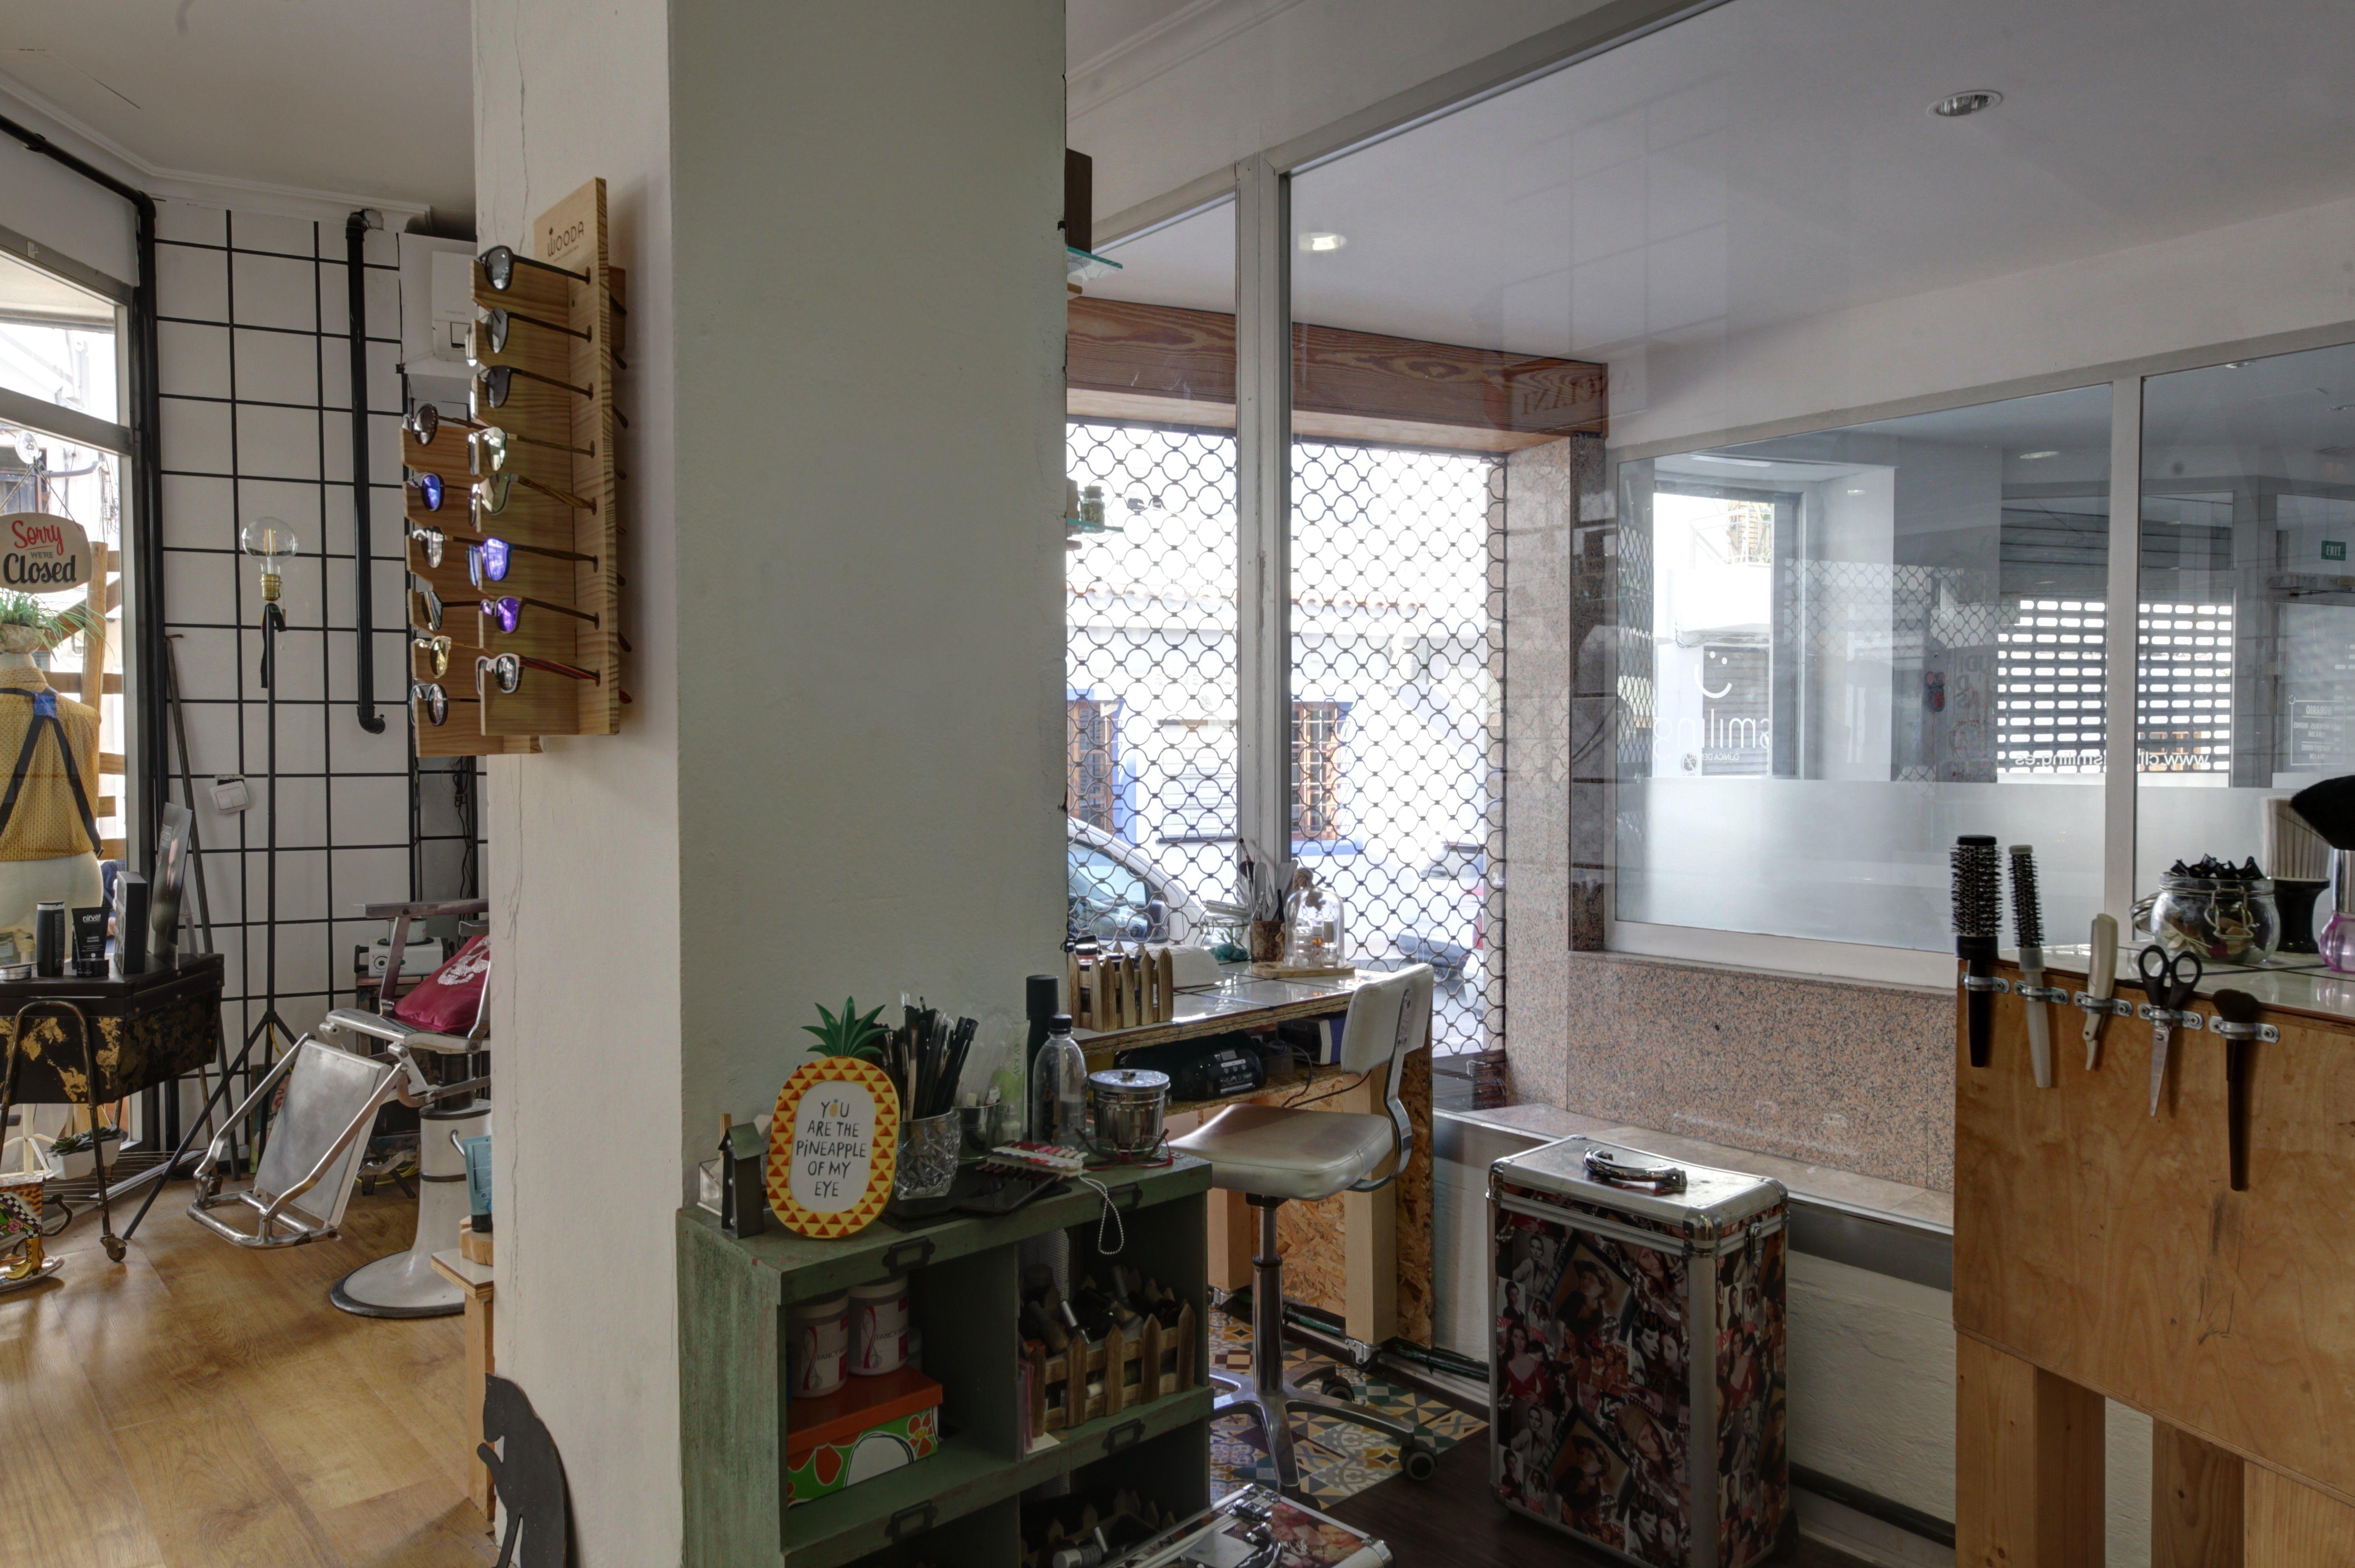 Foto 7 de Hair salons en Sant Antoni de Portmany | Estudio de Laso